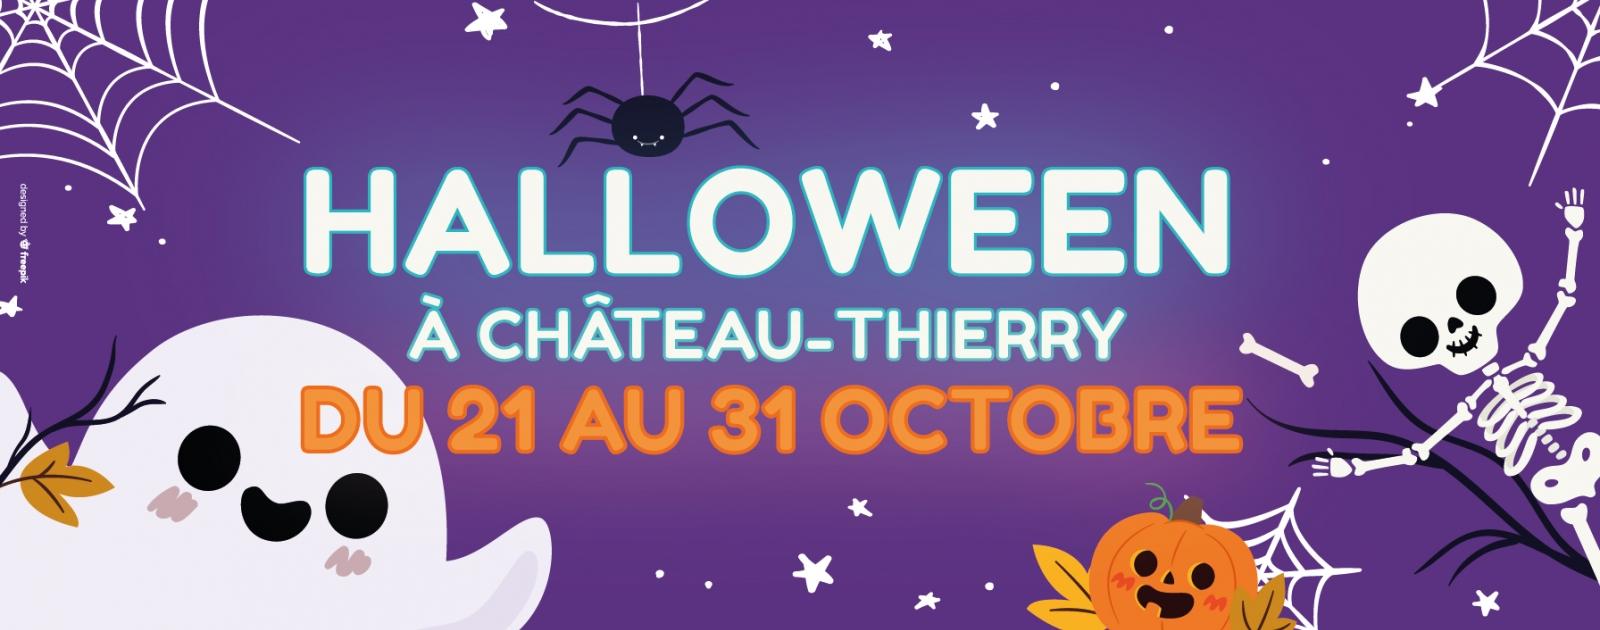 Halloween à Château-Thierry